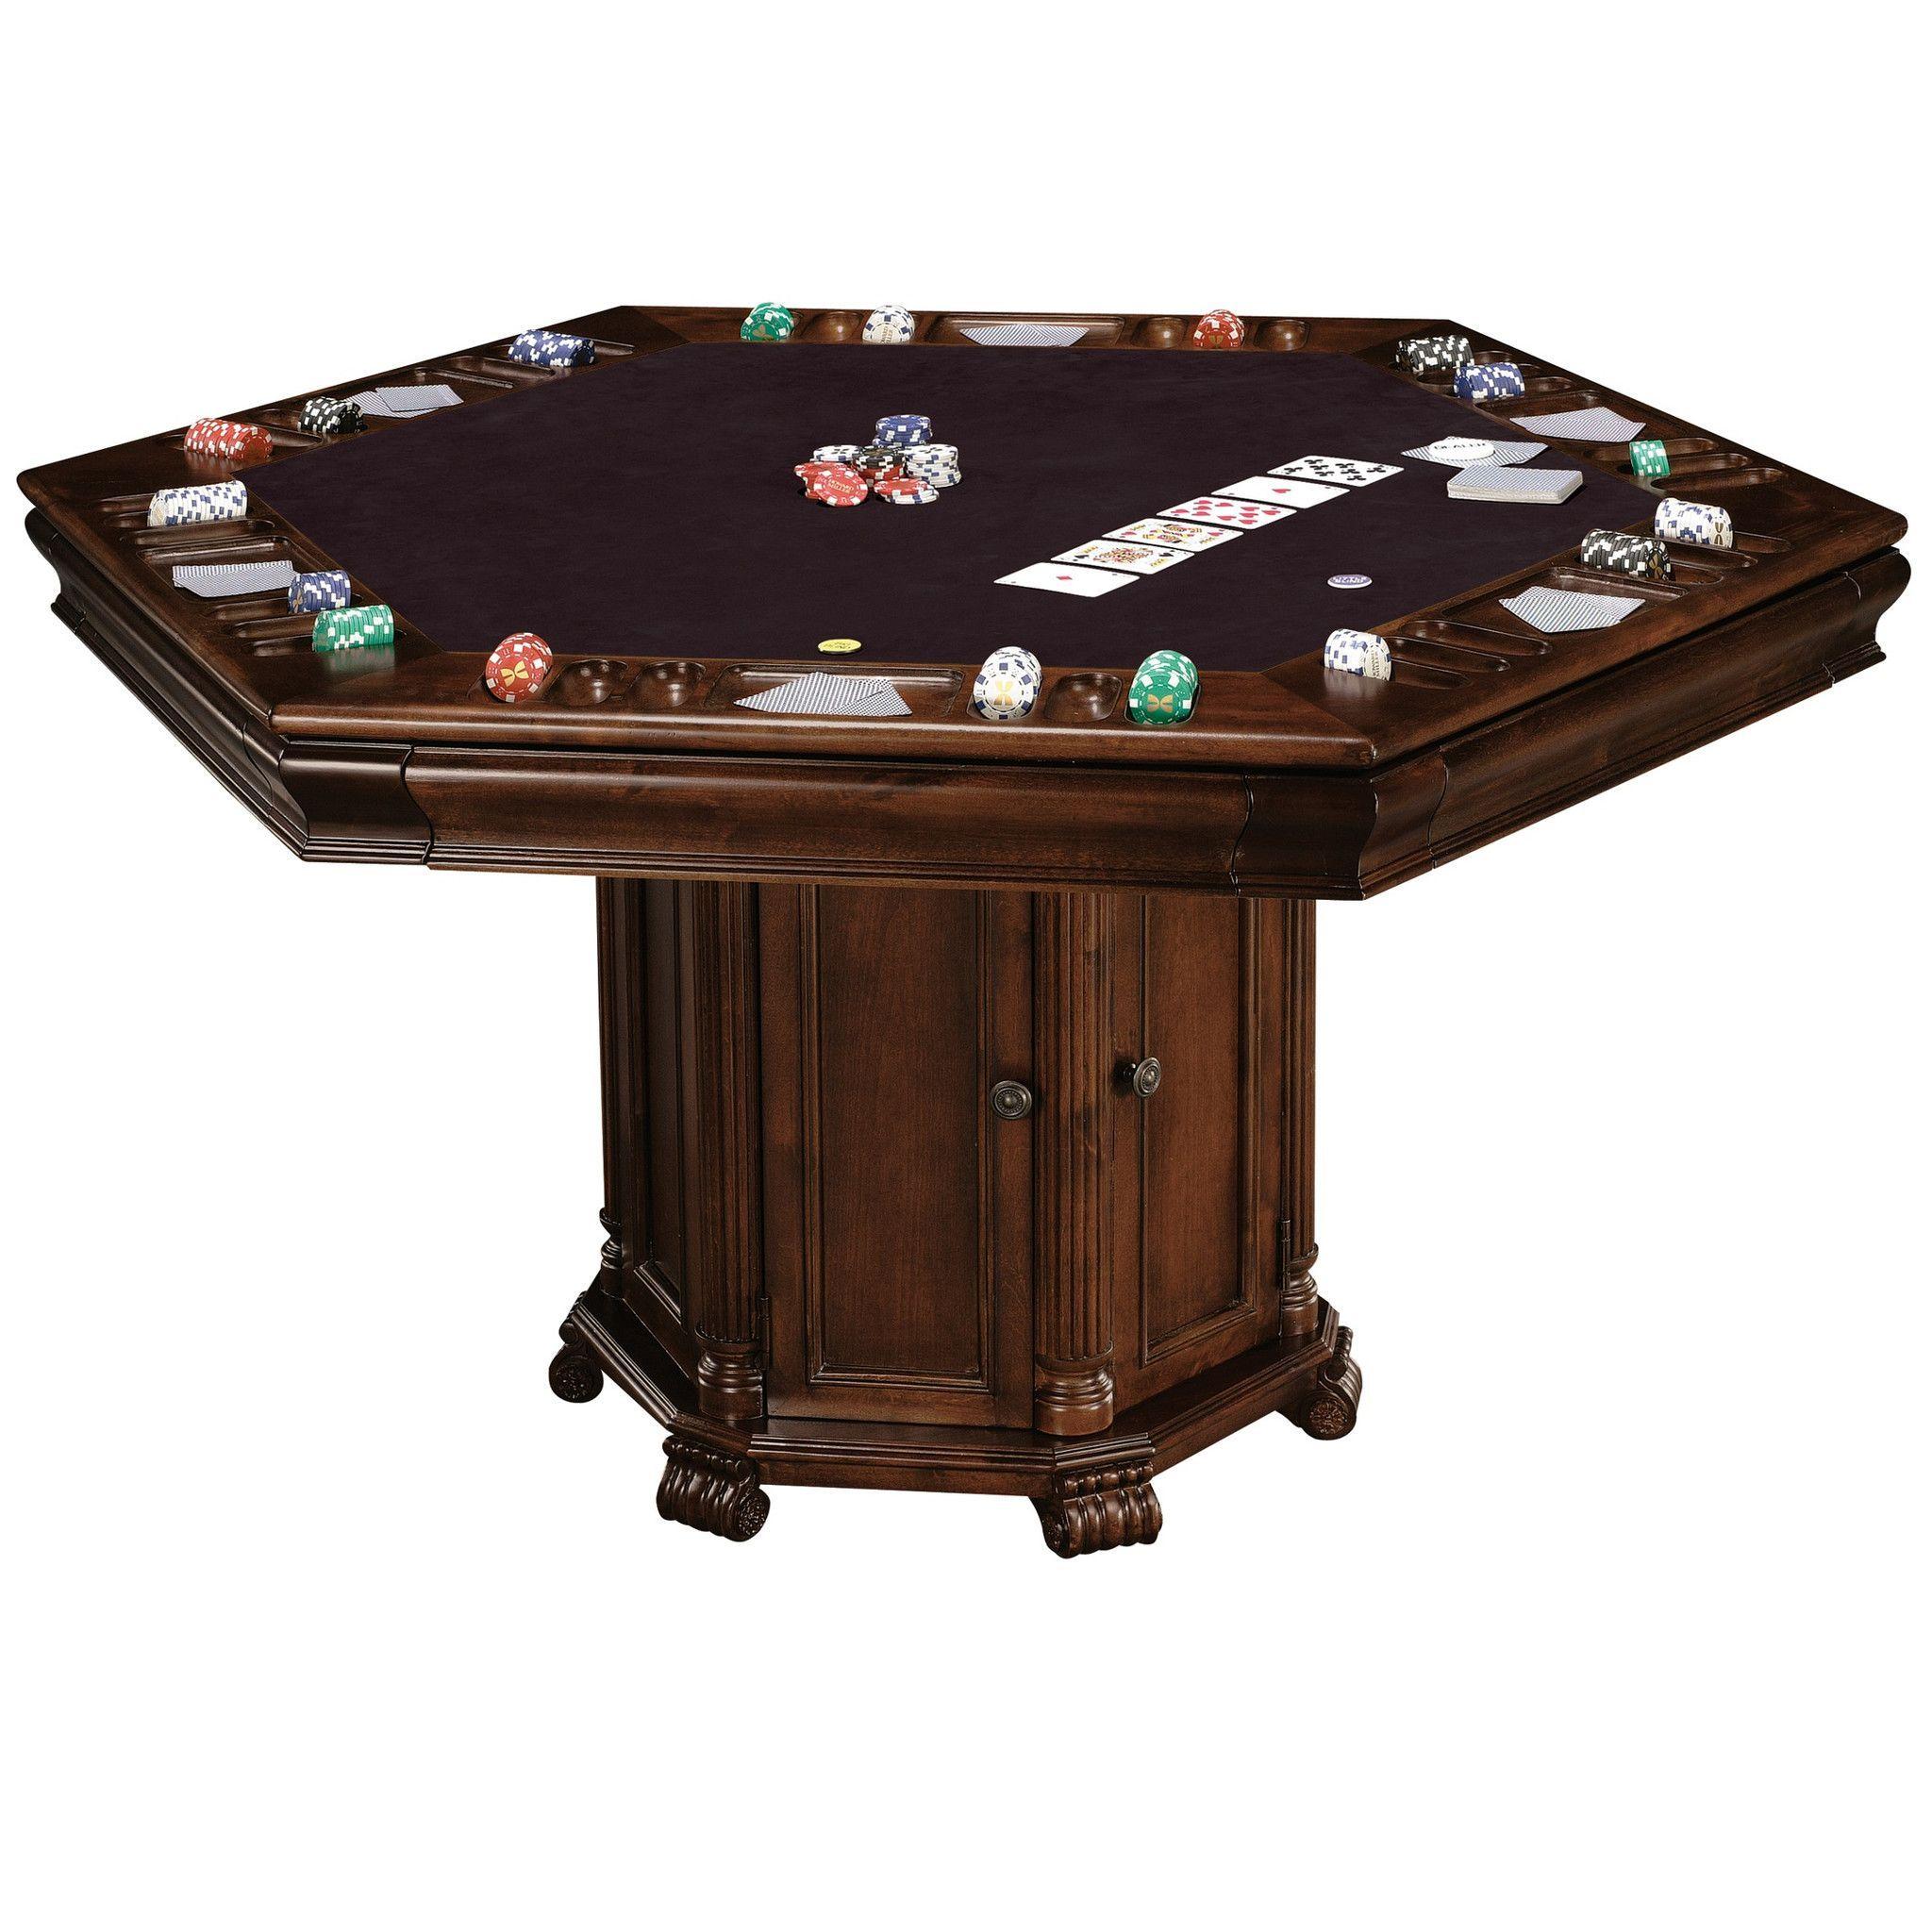 Howard Miller Niagara Game Table 699013 Table games